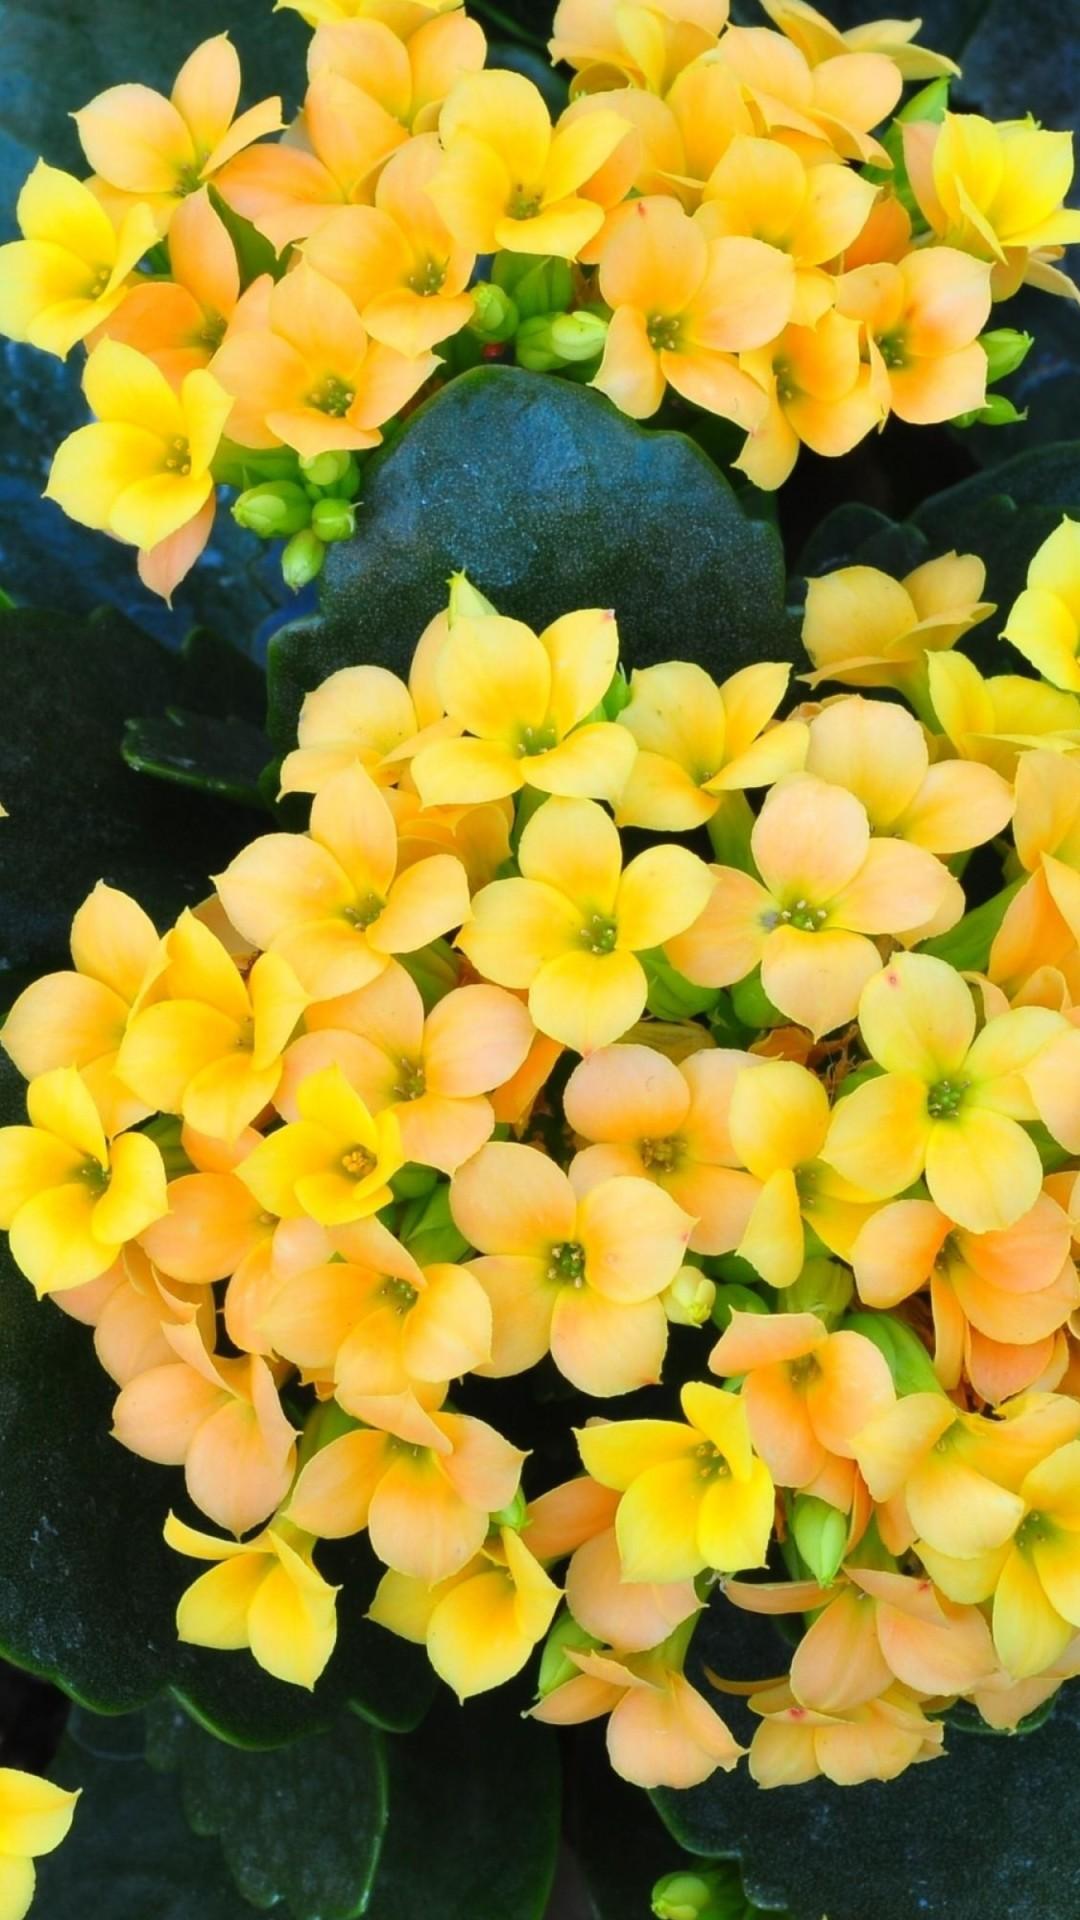 Nature Flowers Bokeh Depth Of Field Yellow Flowers - Yellow Flowers Wall Papers , HD Wallpaper & Backgrounds